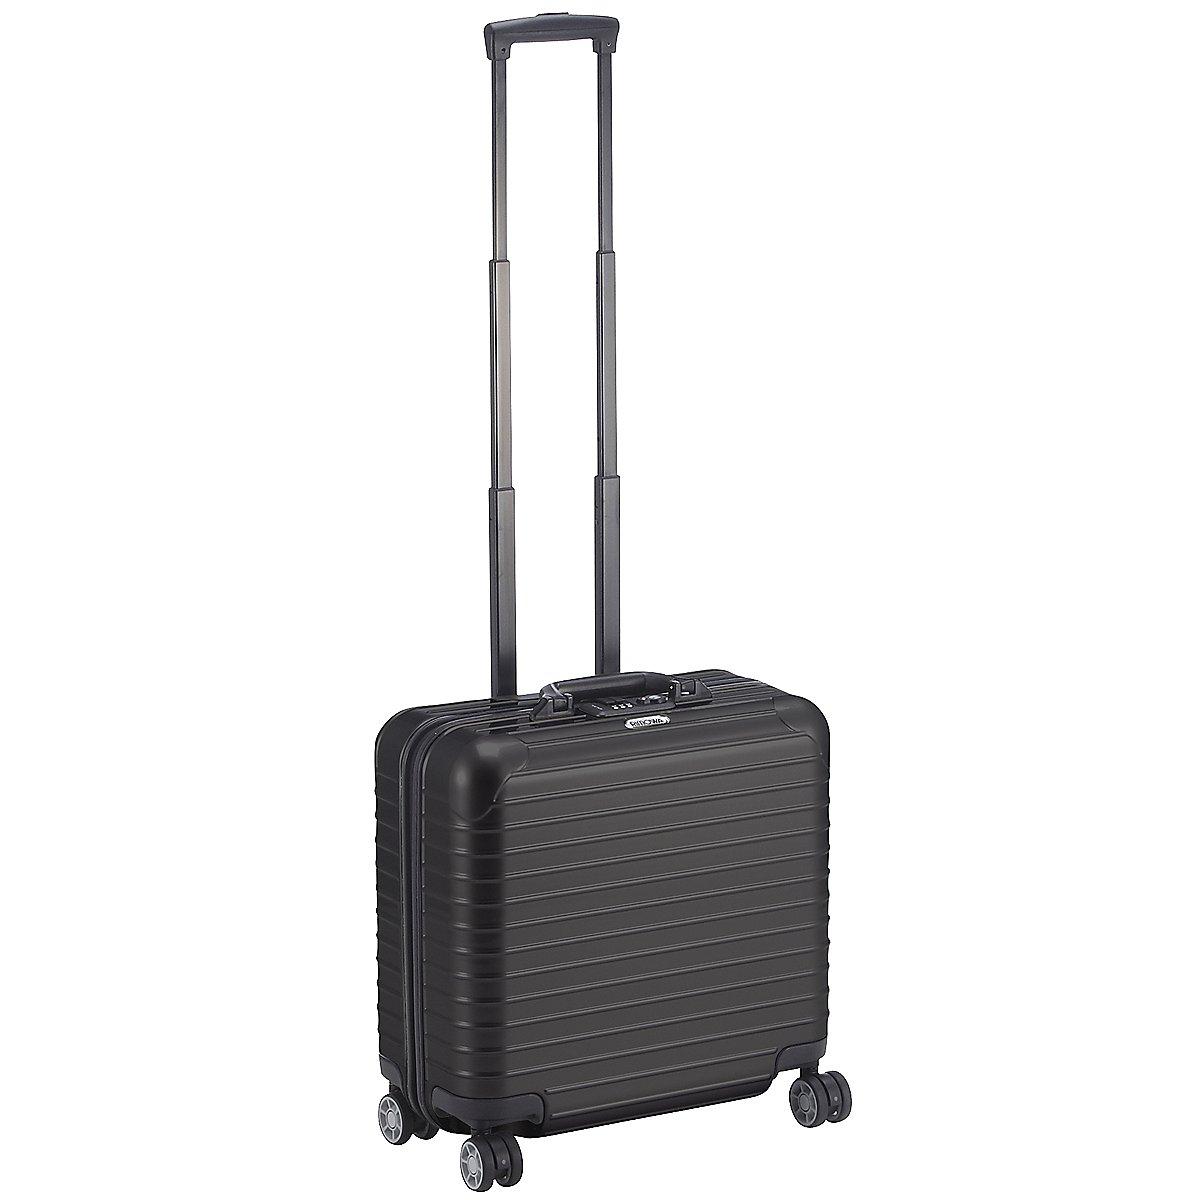 rimowa salsa business multiwheel trolley 42 cm koffer. Black Bedroom Furniture Sets. Home Design Ideas